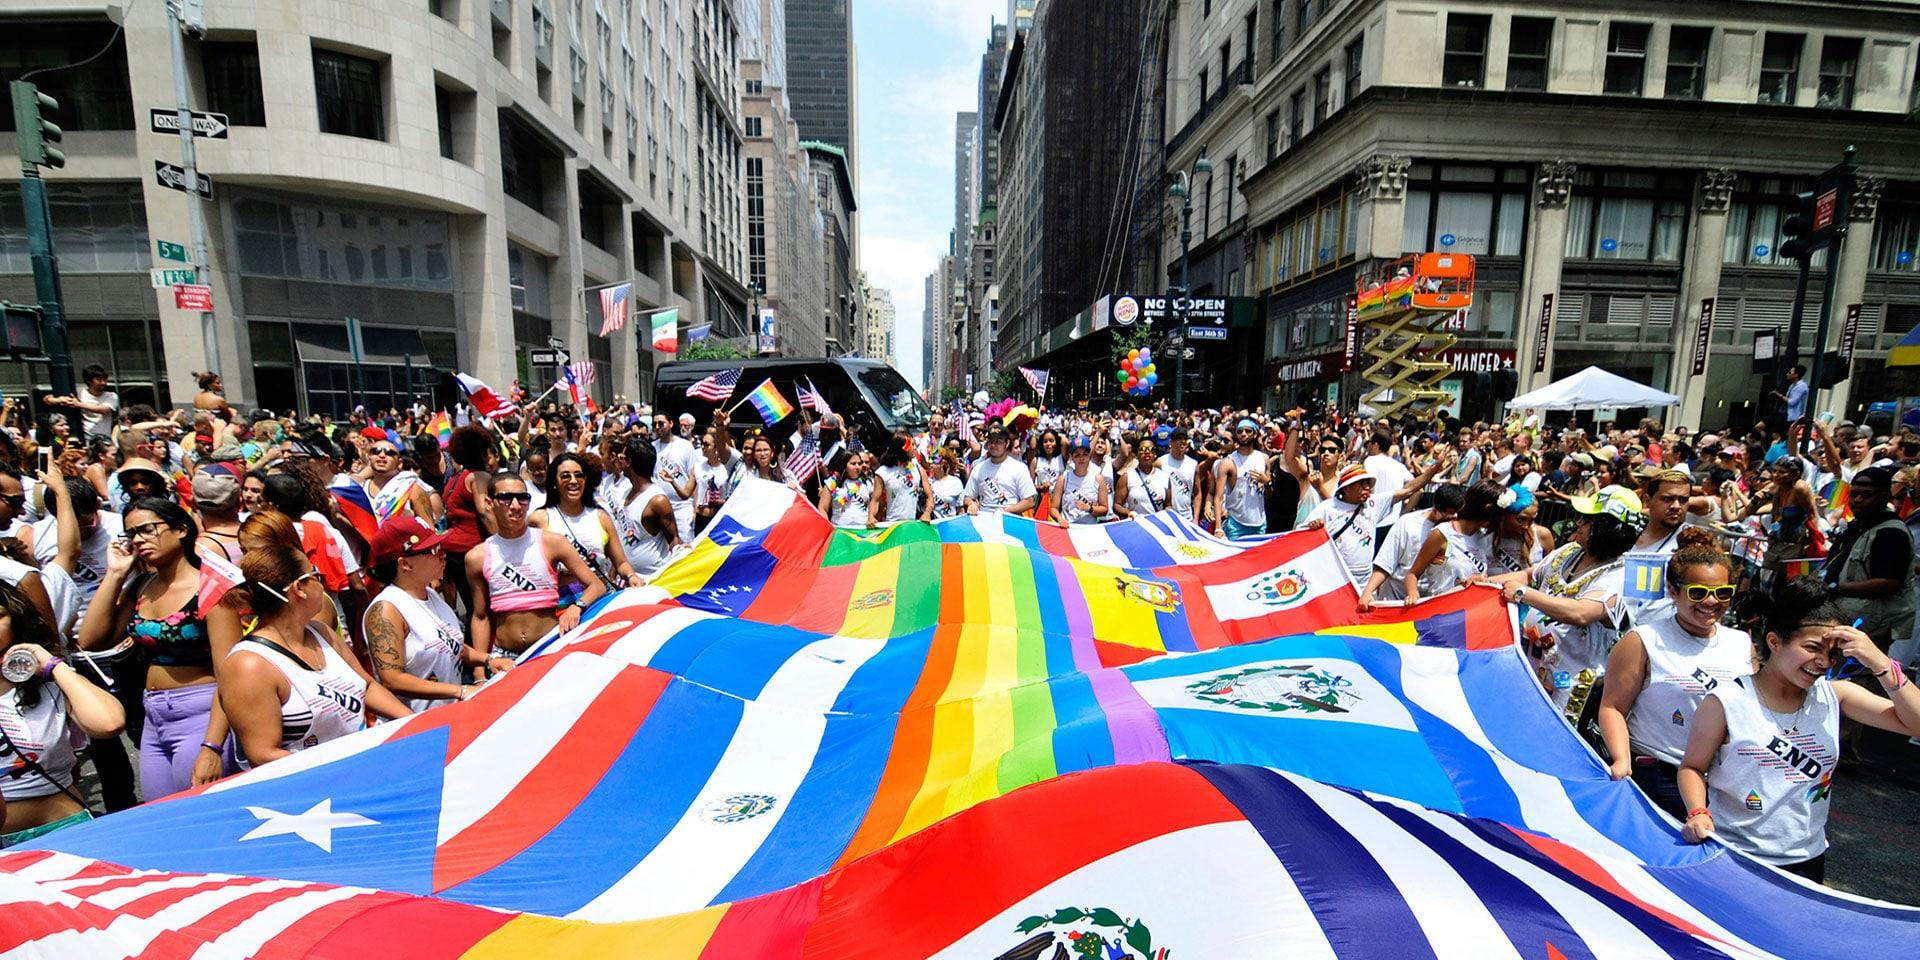 Plan the Perfect Pride Weekend in NYC | Marriott Bonvoy Traveler